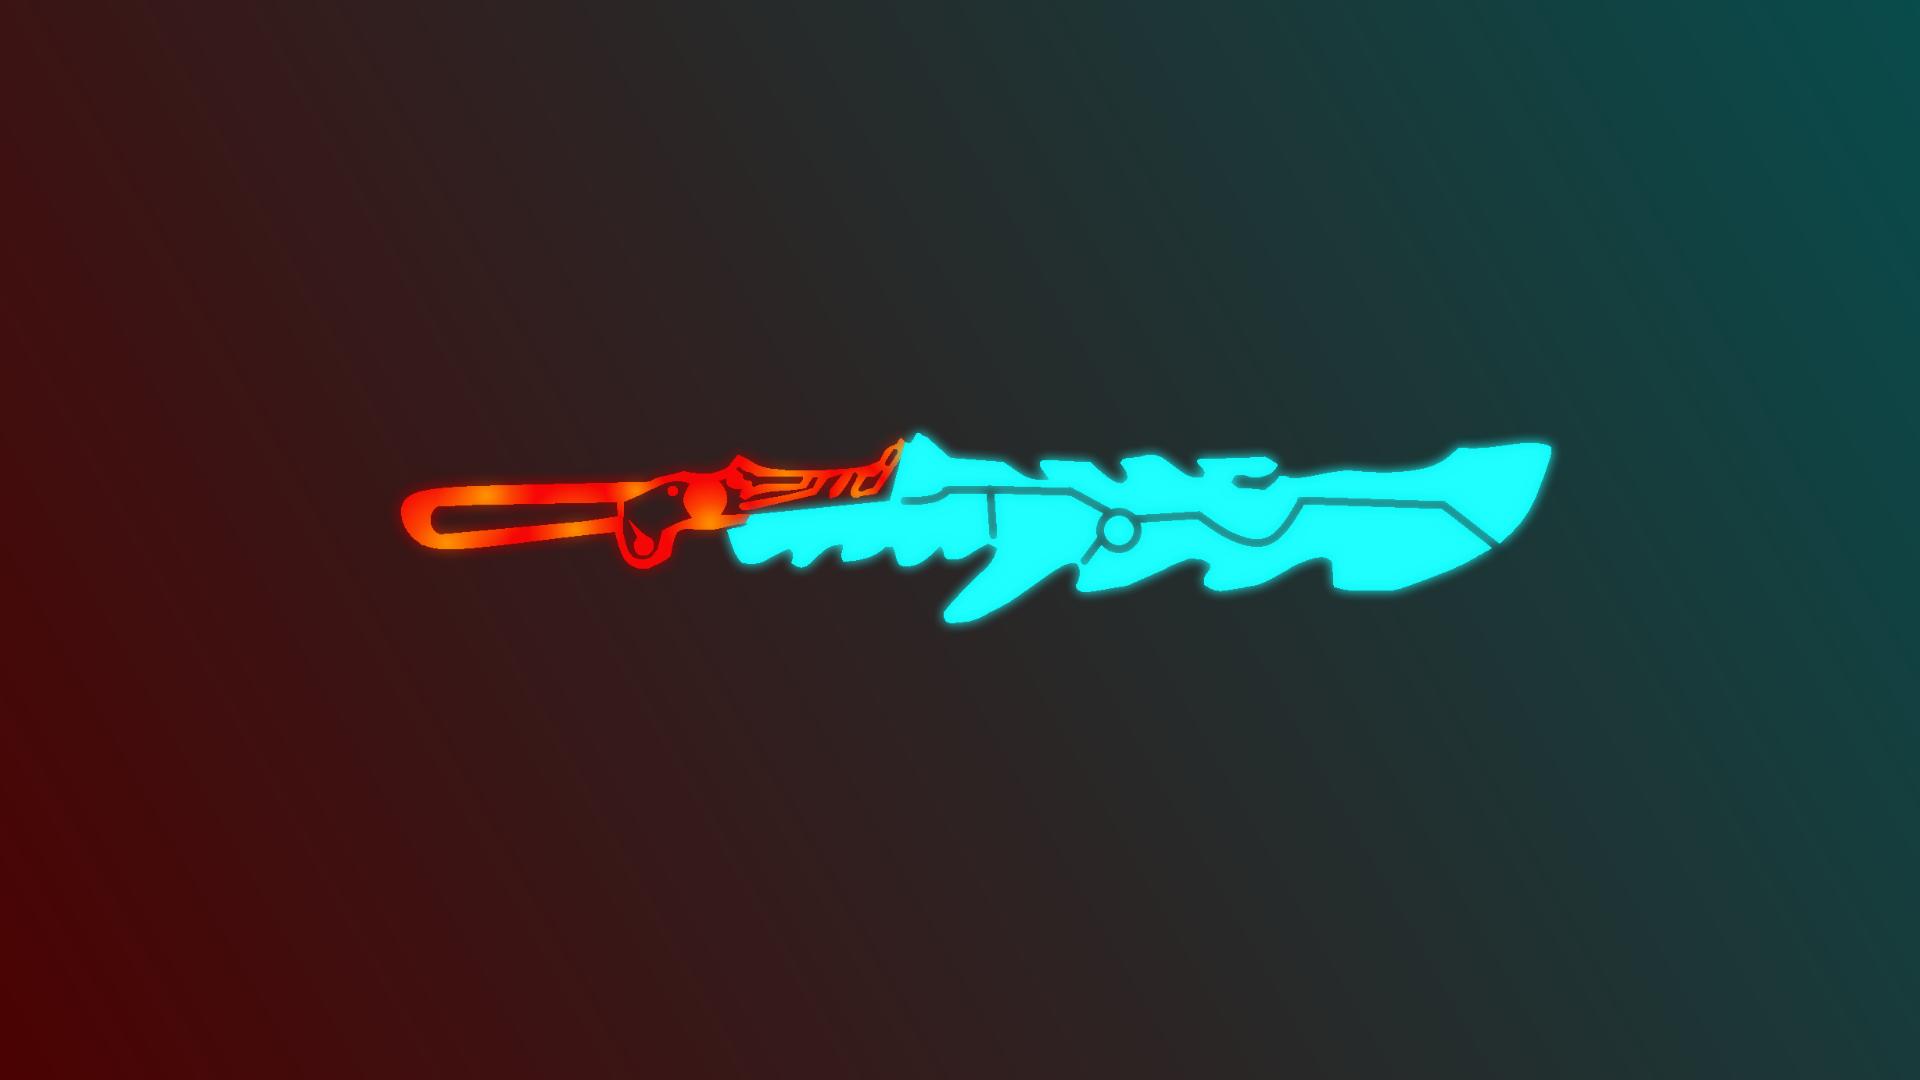 Guardian Sword Botw Minimalist Wallpaper 1080p By Sp5rky On Deviantart